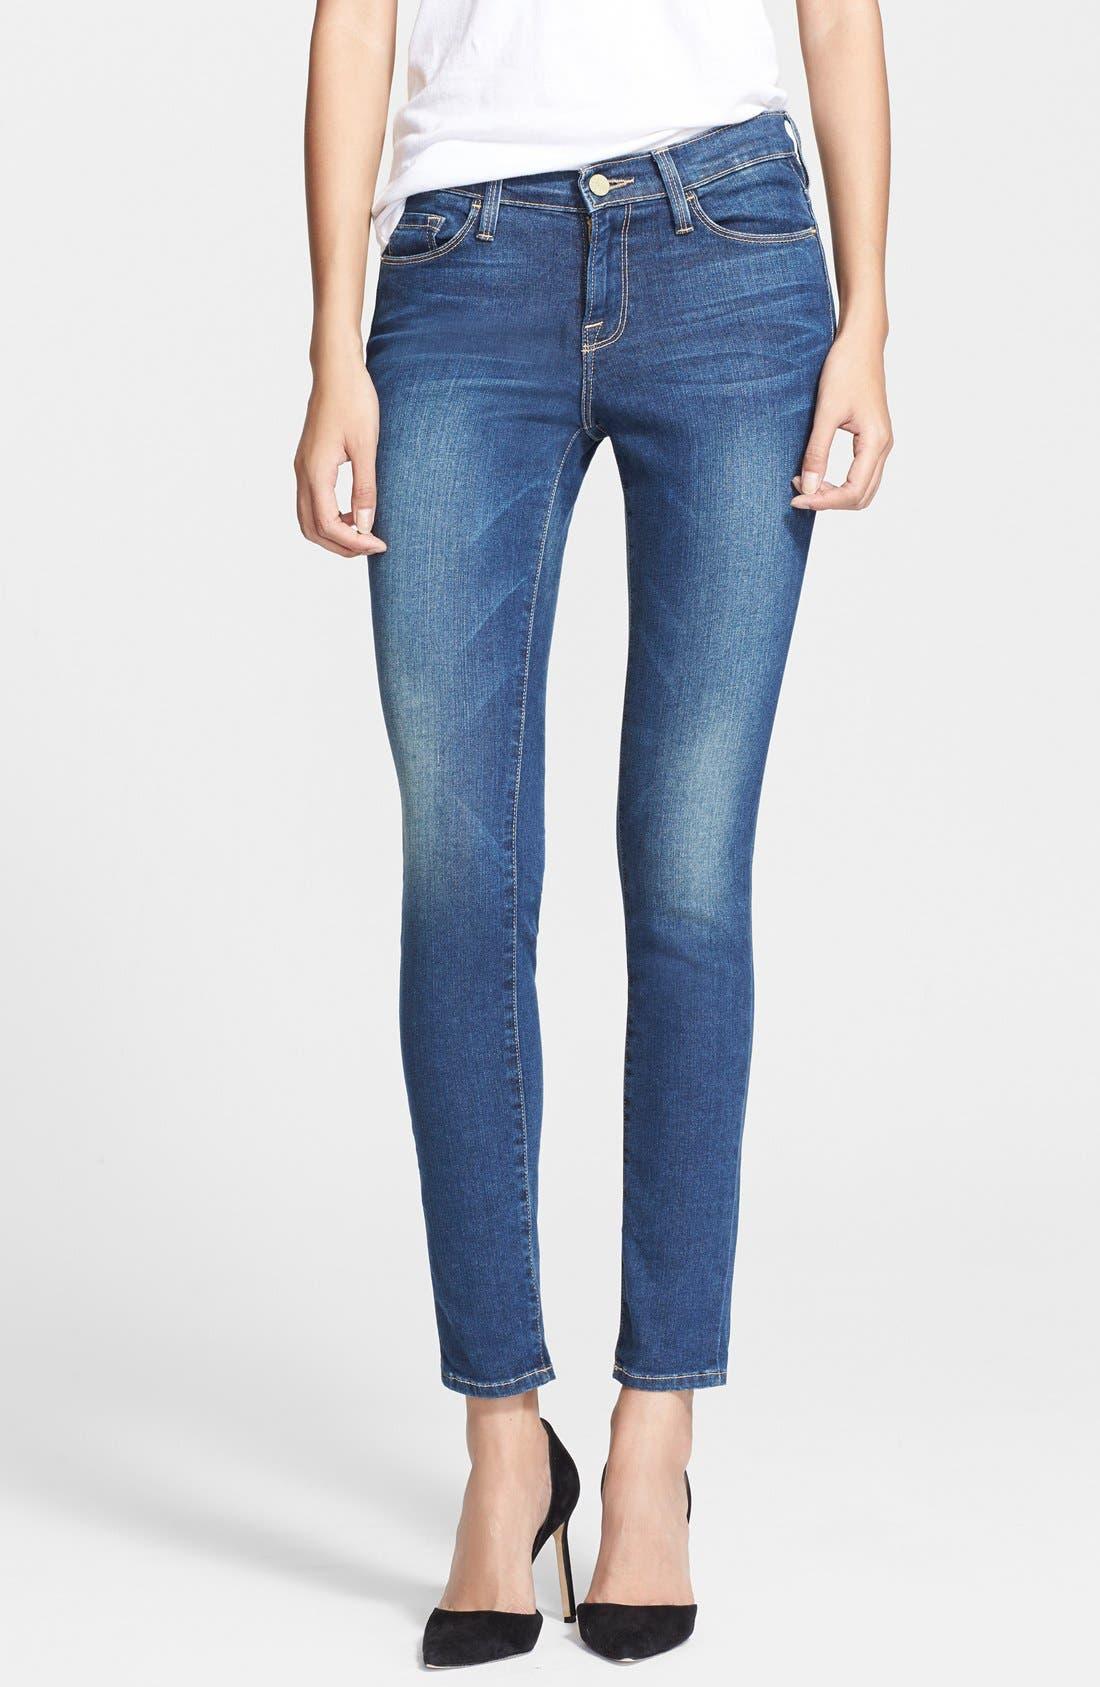 Main Image - Frame Denim 'Le Skinny de Jeanne' Jeans (Columbia Road)